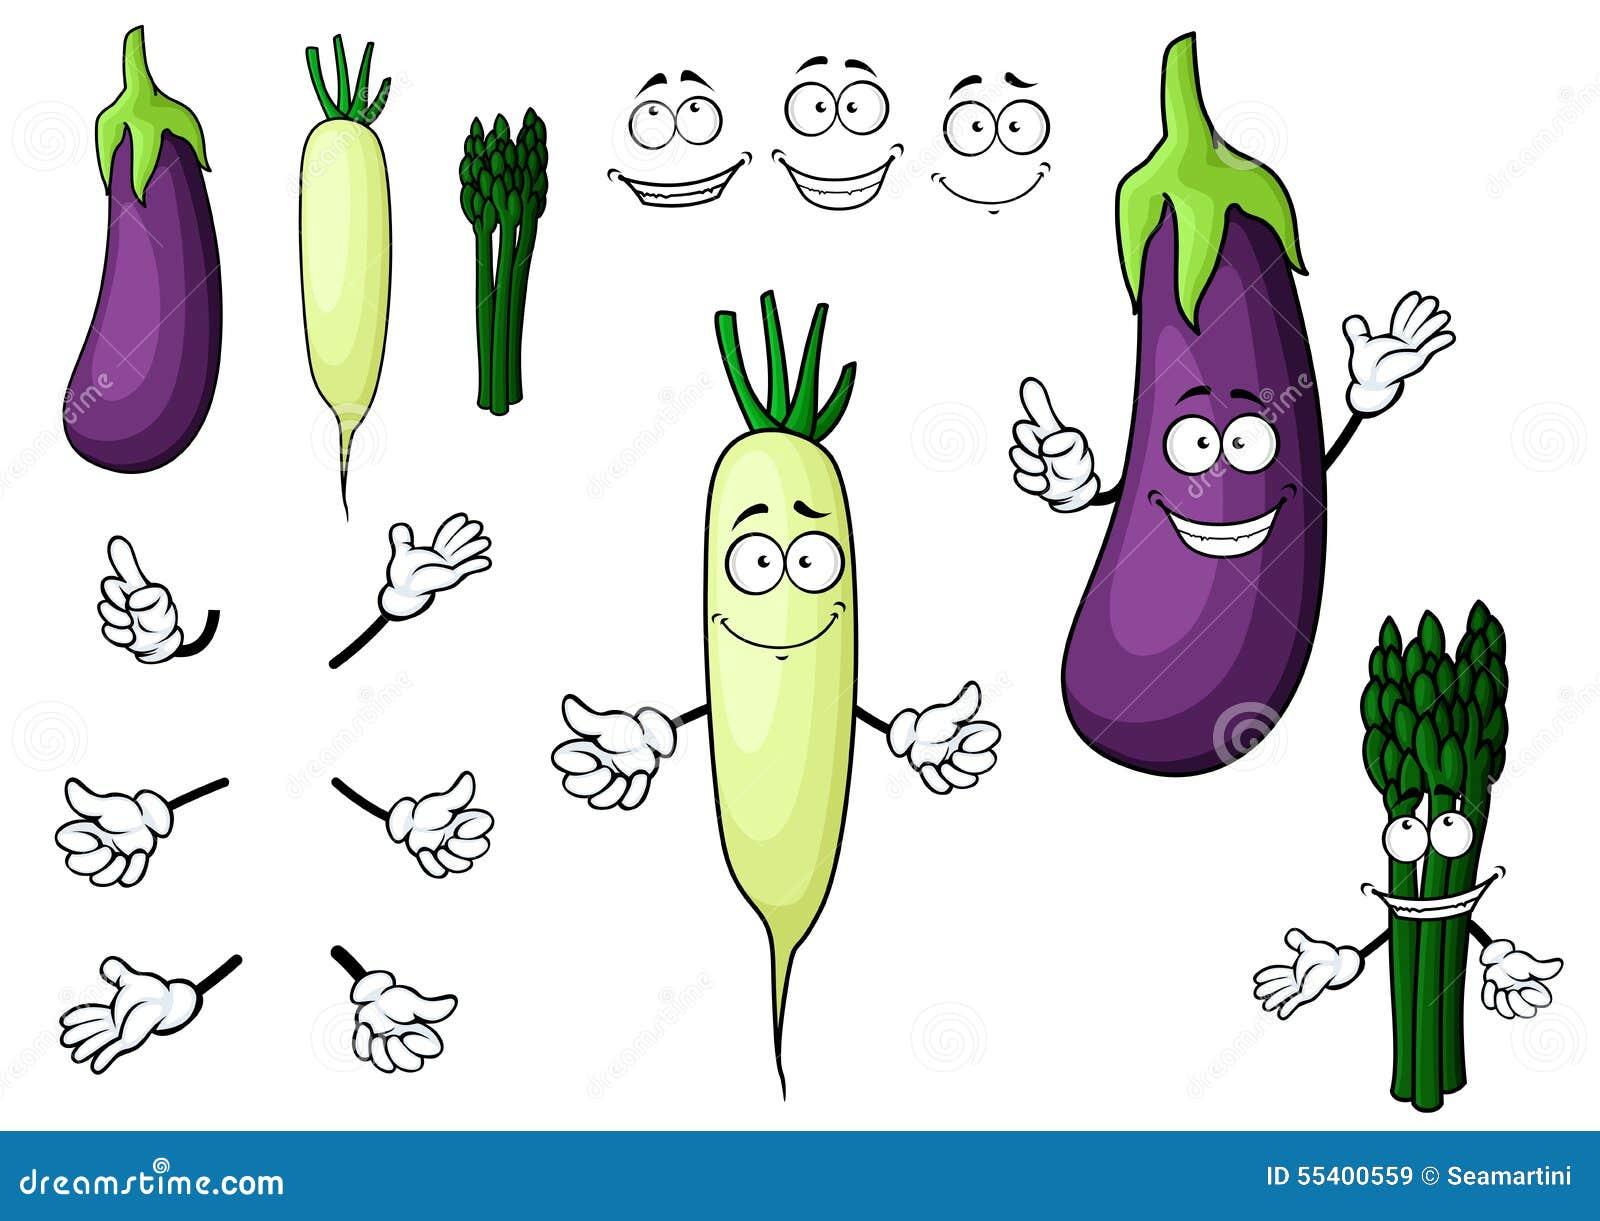 Eggplant, White Radish, Asparagus Vegetables Stock Vector